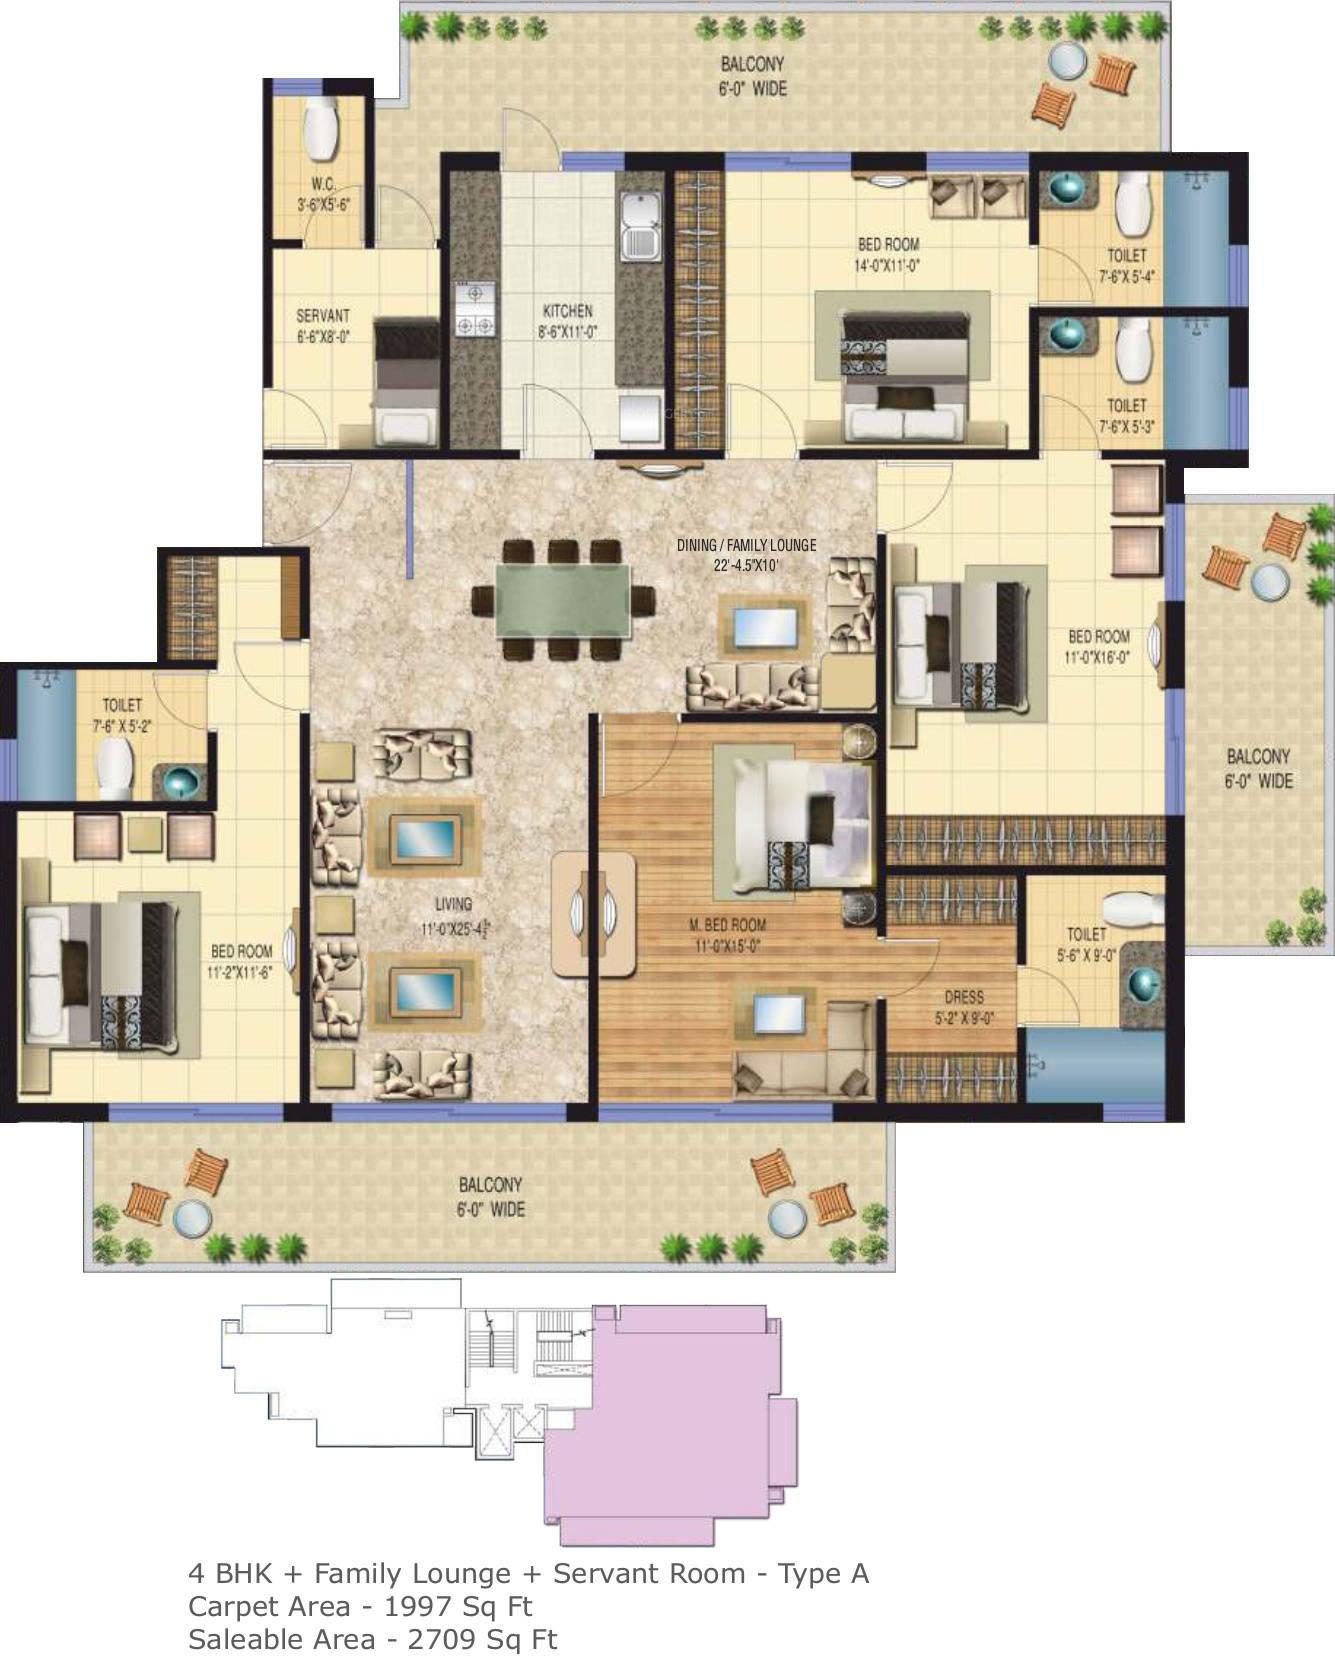 Floor Plan of 4bhk 2709 sqft in Sarvome The Presidio faridabad